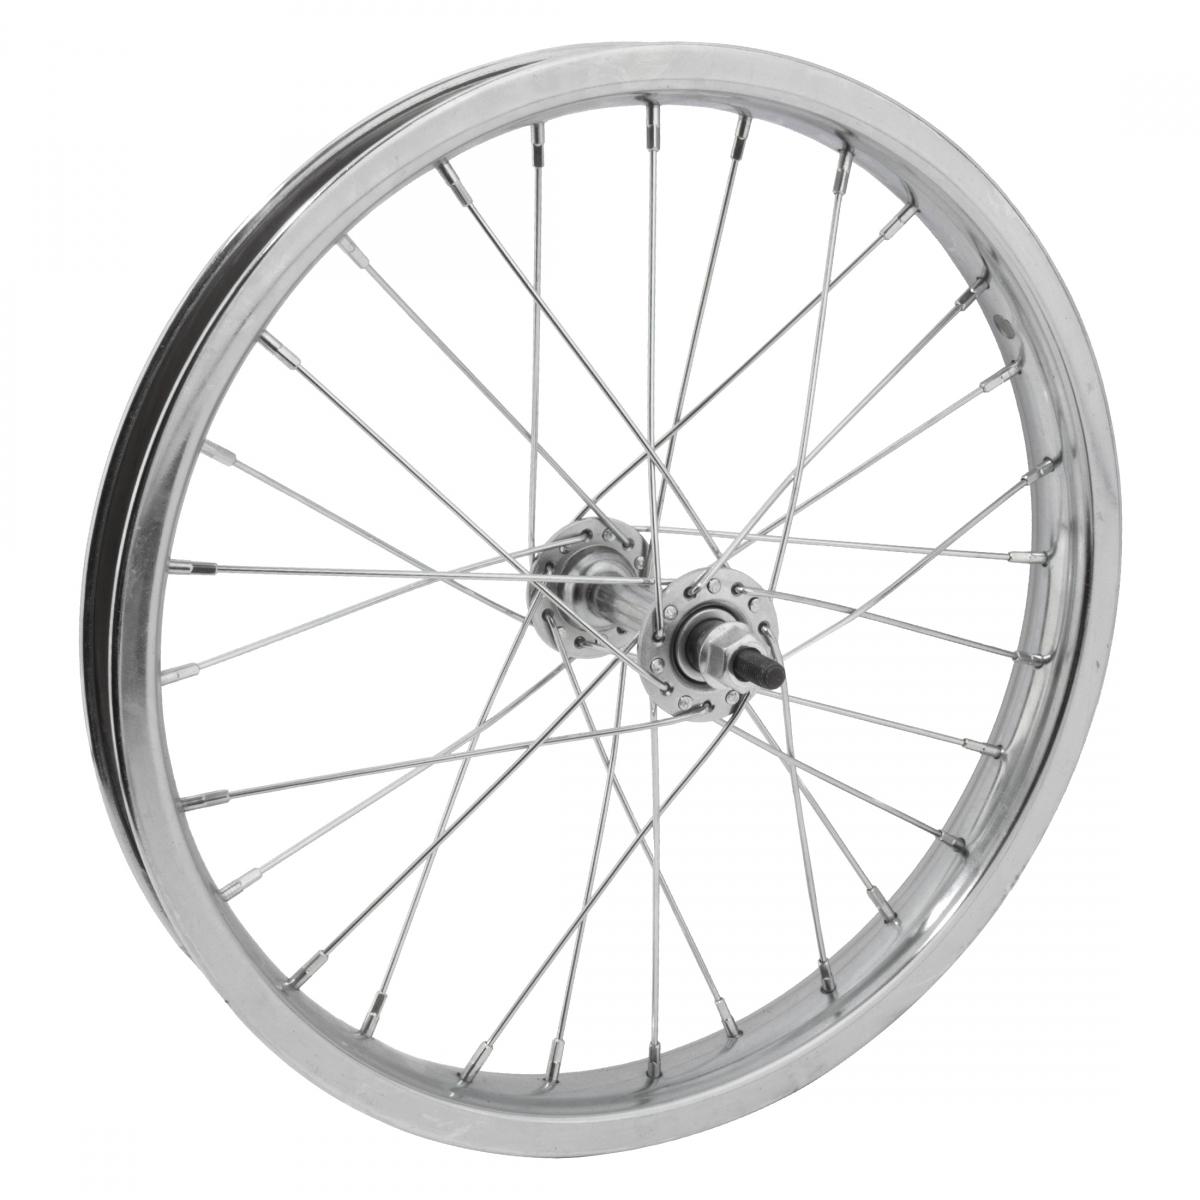 Wheel Masters Wheel Front 20X1.75 406X24 Wei Dm30 Sl 36 Aly Bo 3//8 Sl Ss2.0Sl